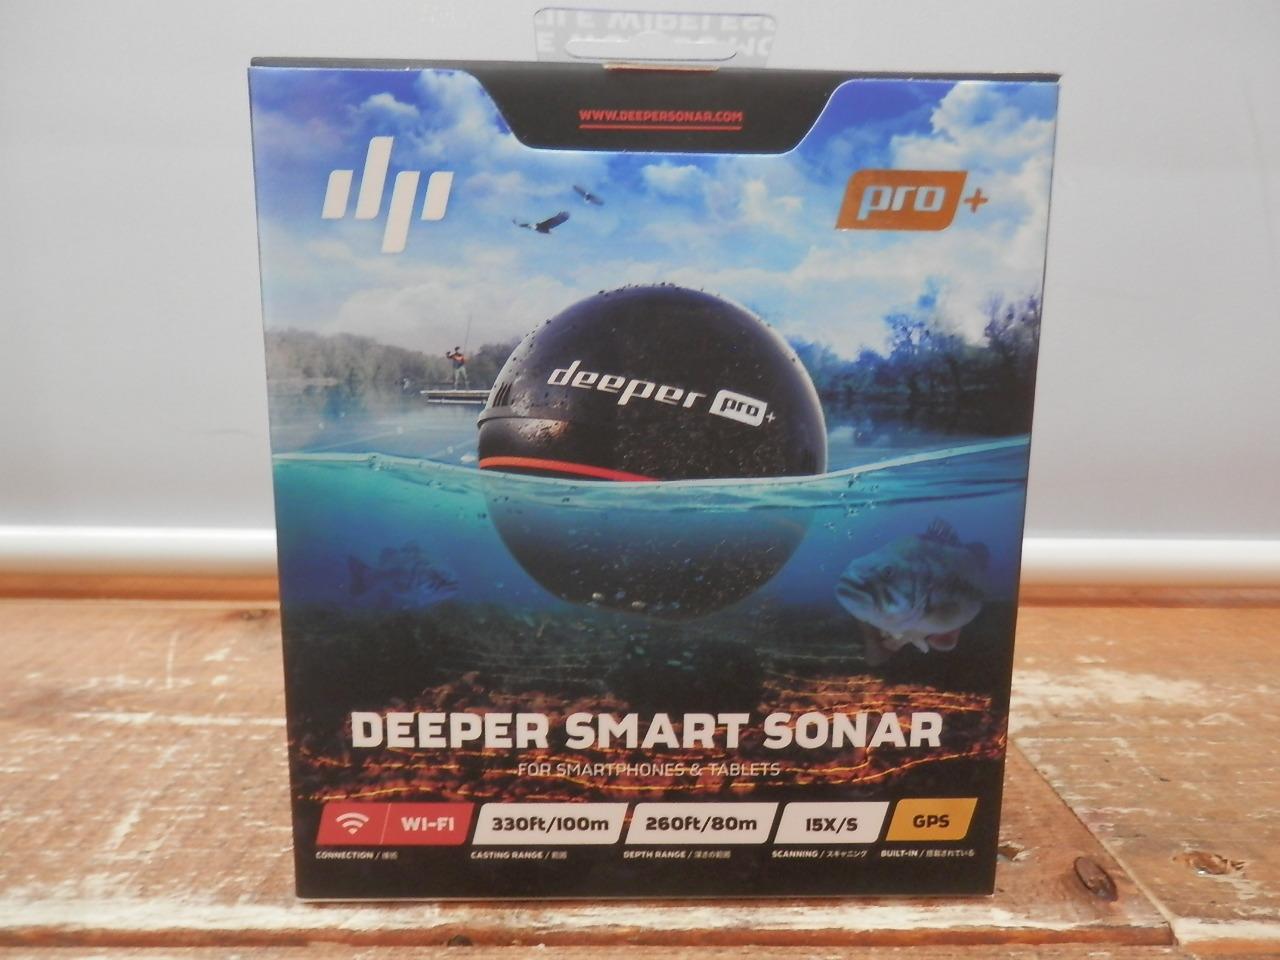 DeeperDeeper Pro+ 魚群探知機FRI-BT-000004【中古】【フィッシング/釣り/釣具/その他釣具】